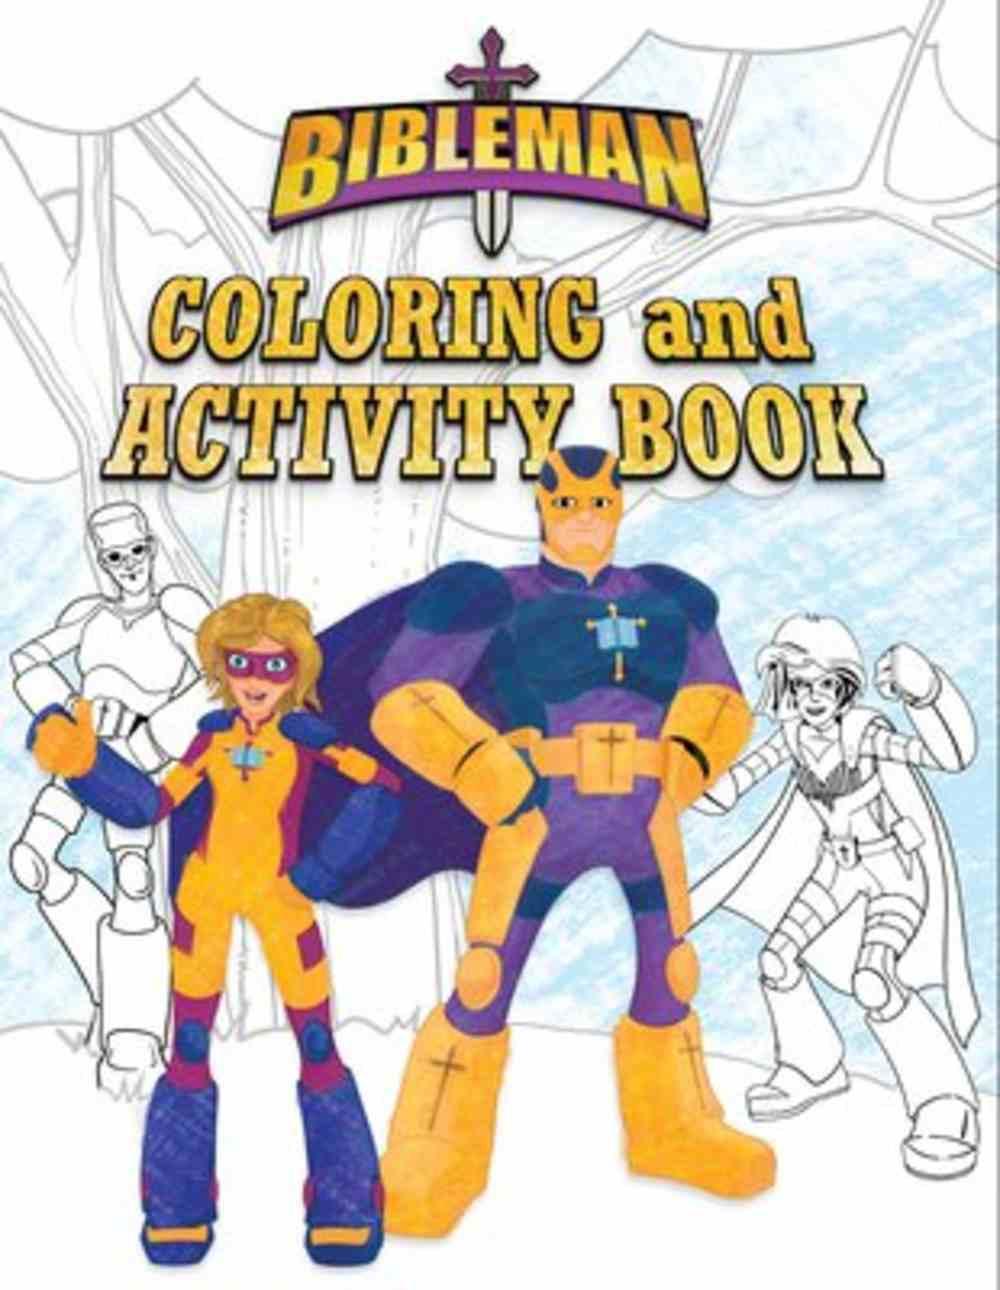 Bibleman Coloring and Activity Book Paperback